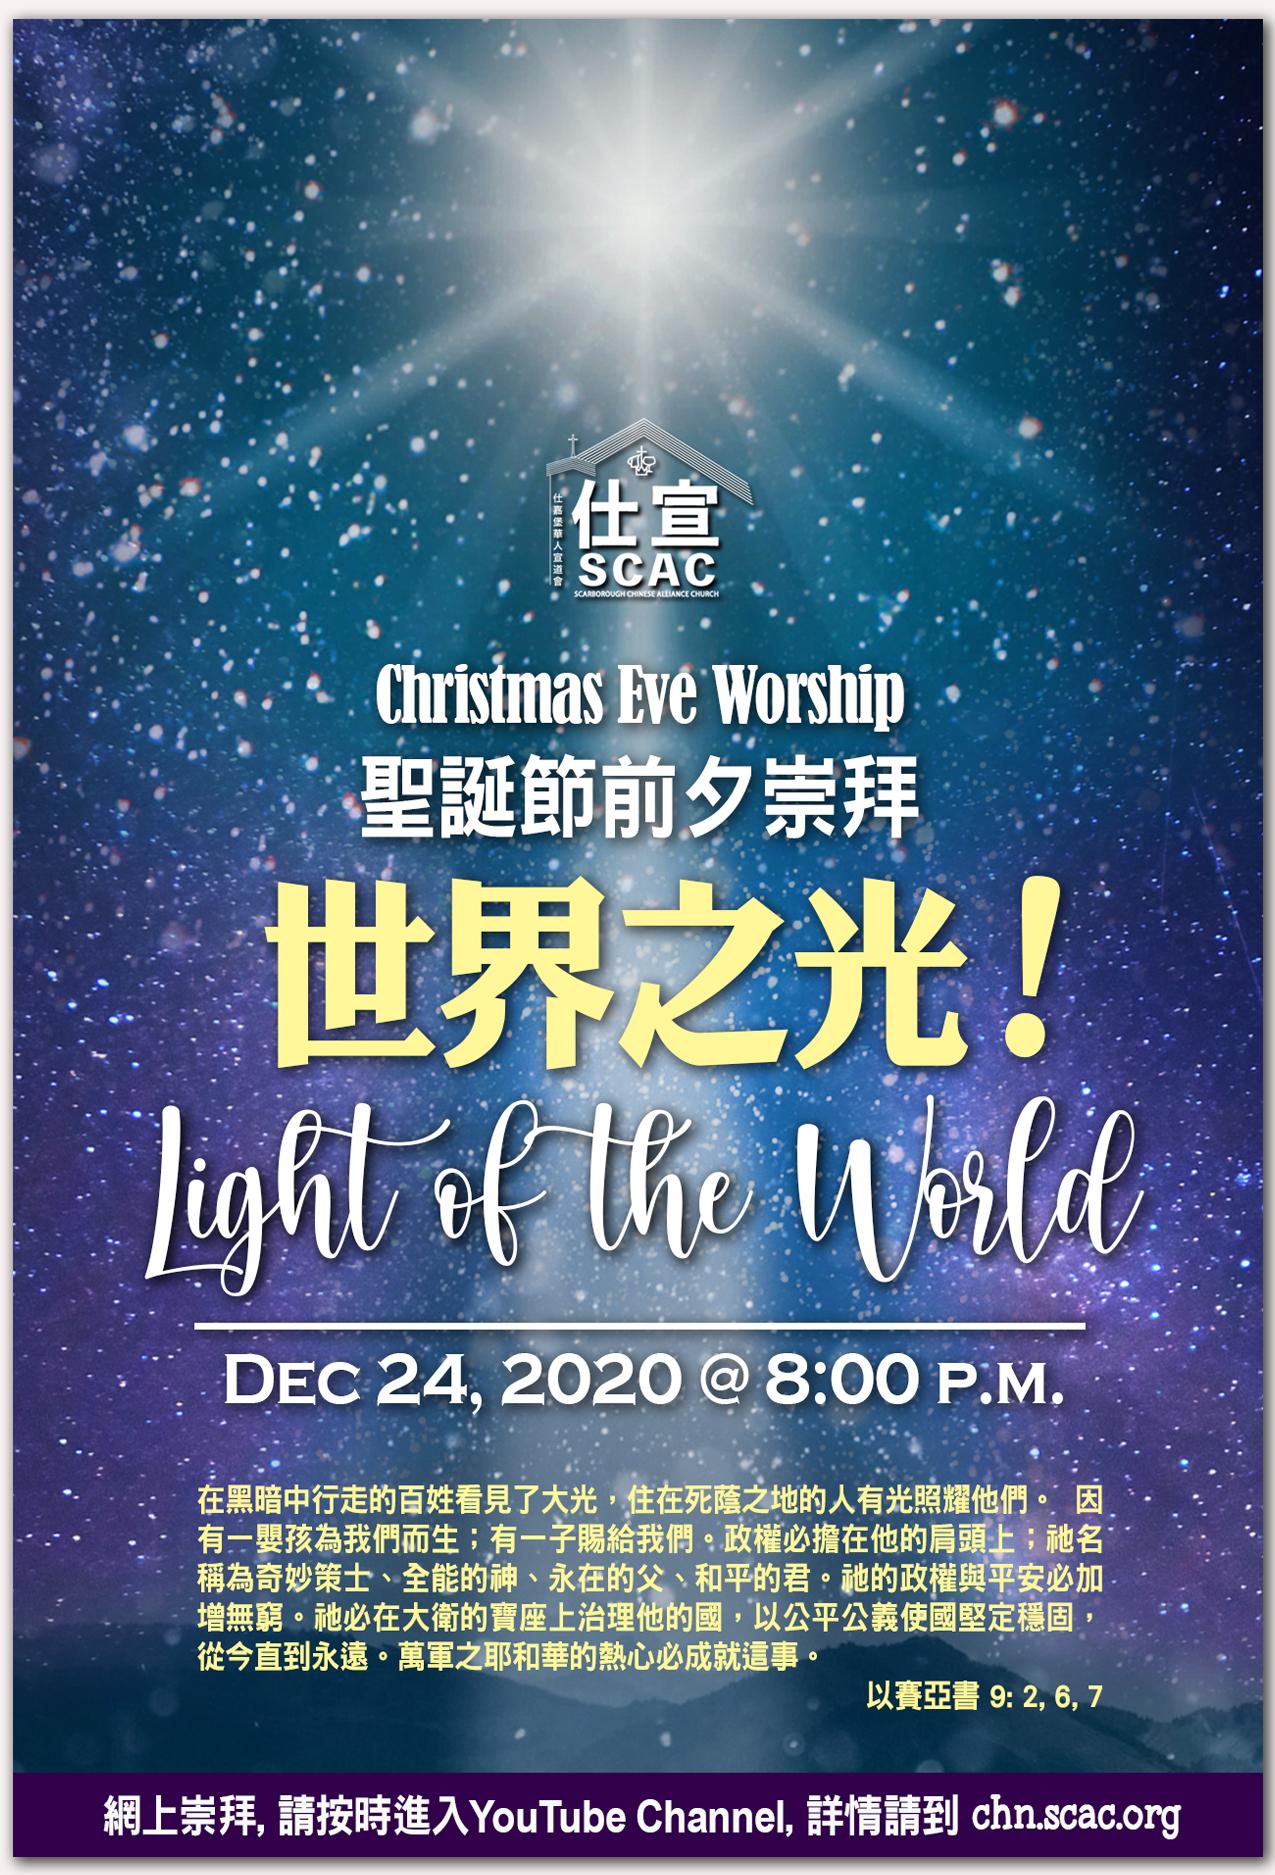 SCAC Christmas 2020 - Light of the World